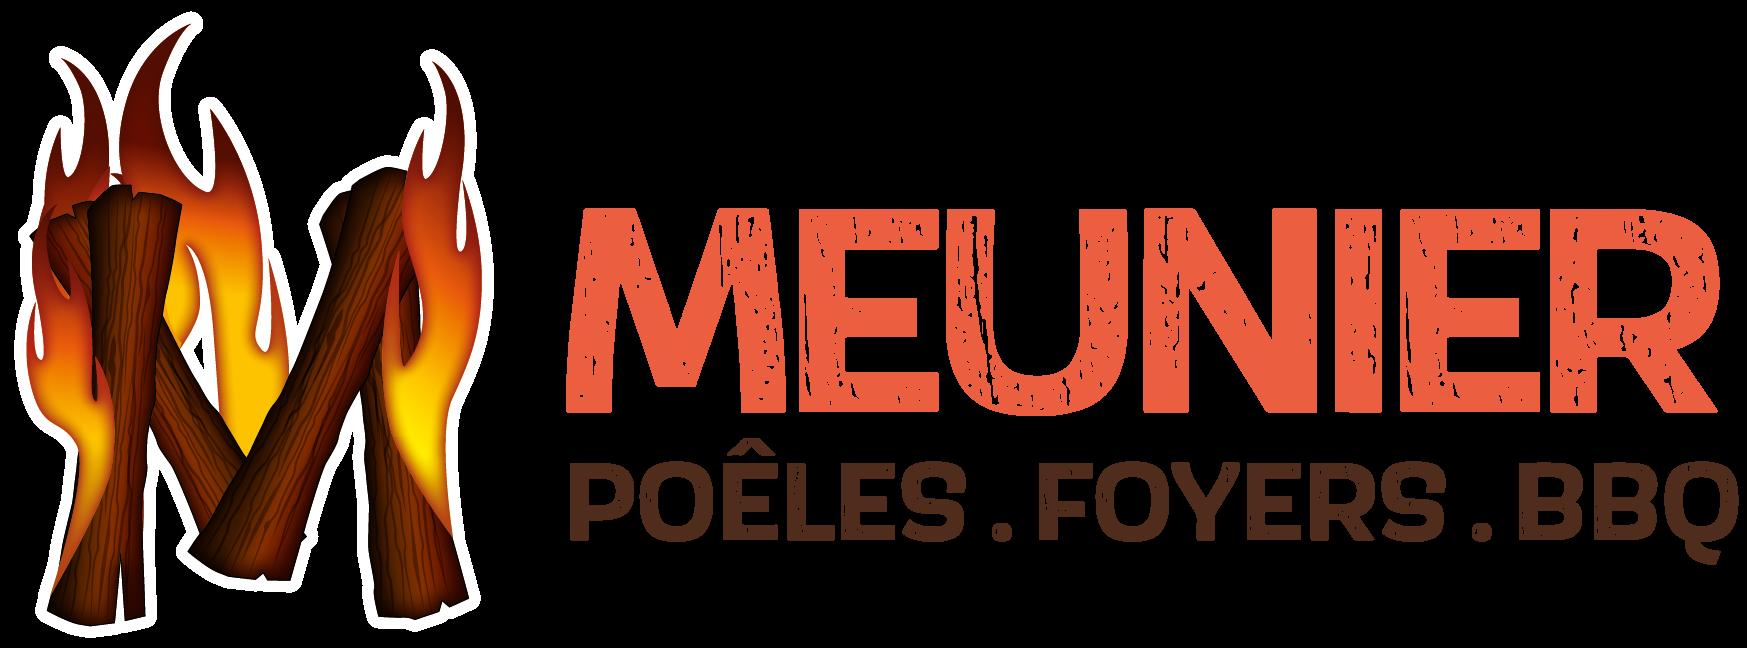 MEUNIER-LOGO-COULEURS_1